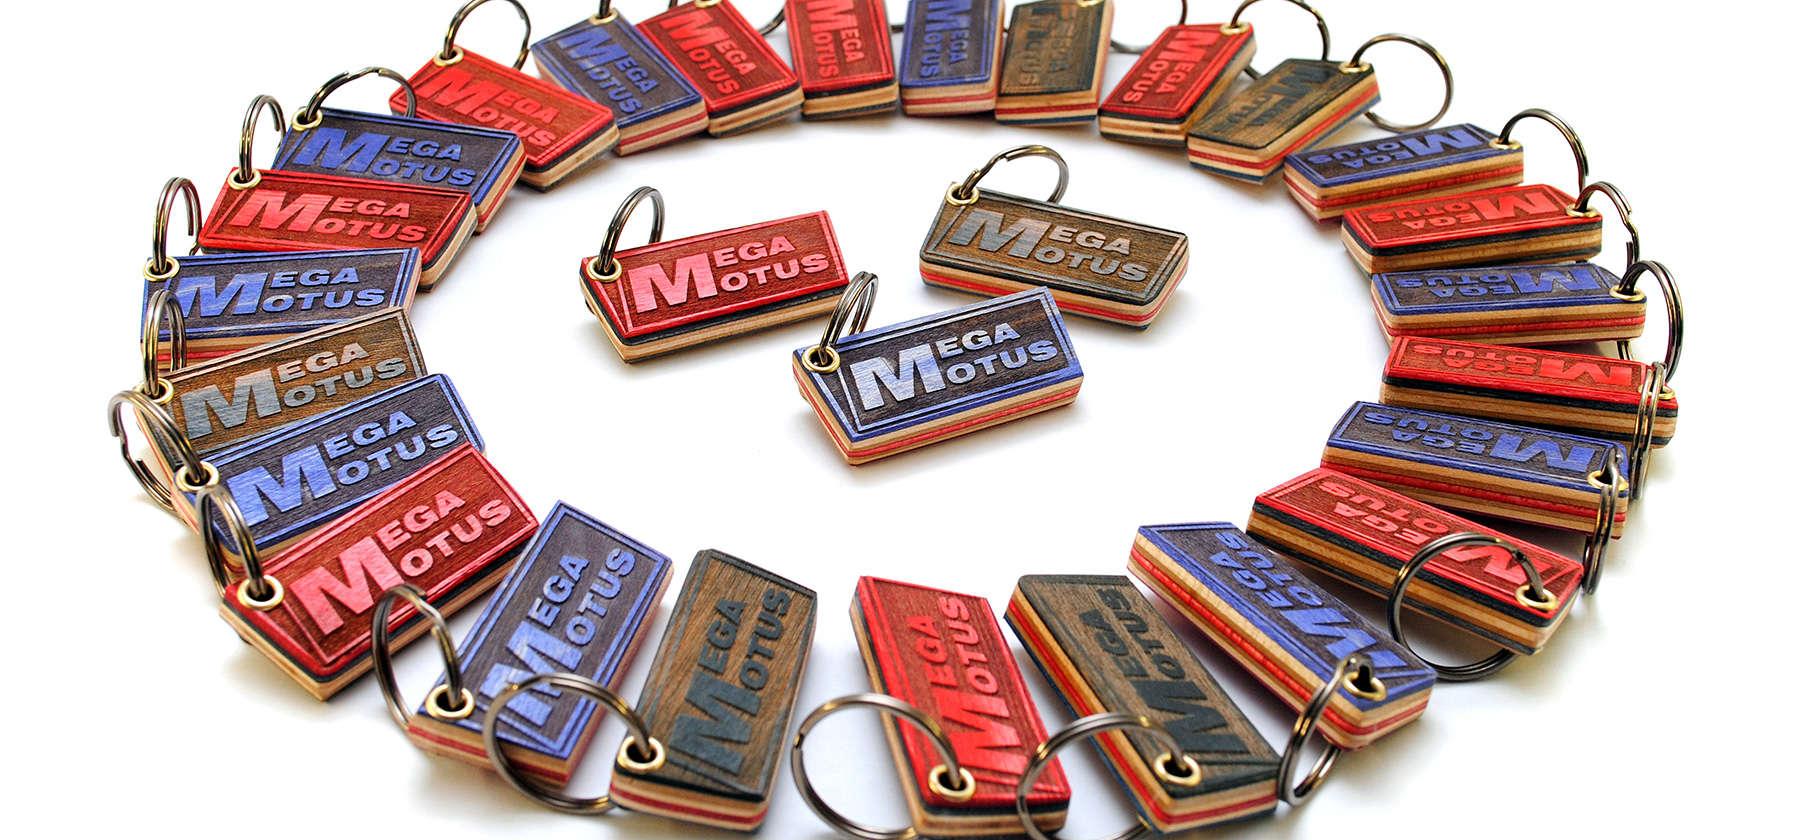 Megamotus keychains